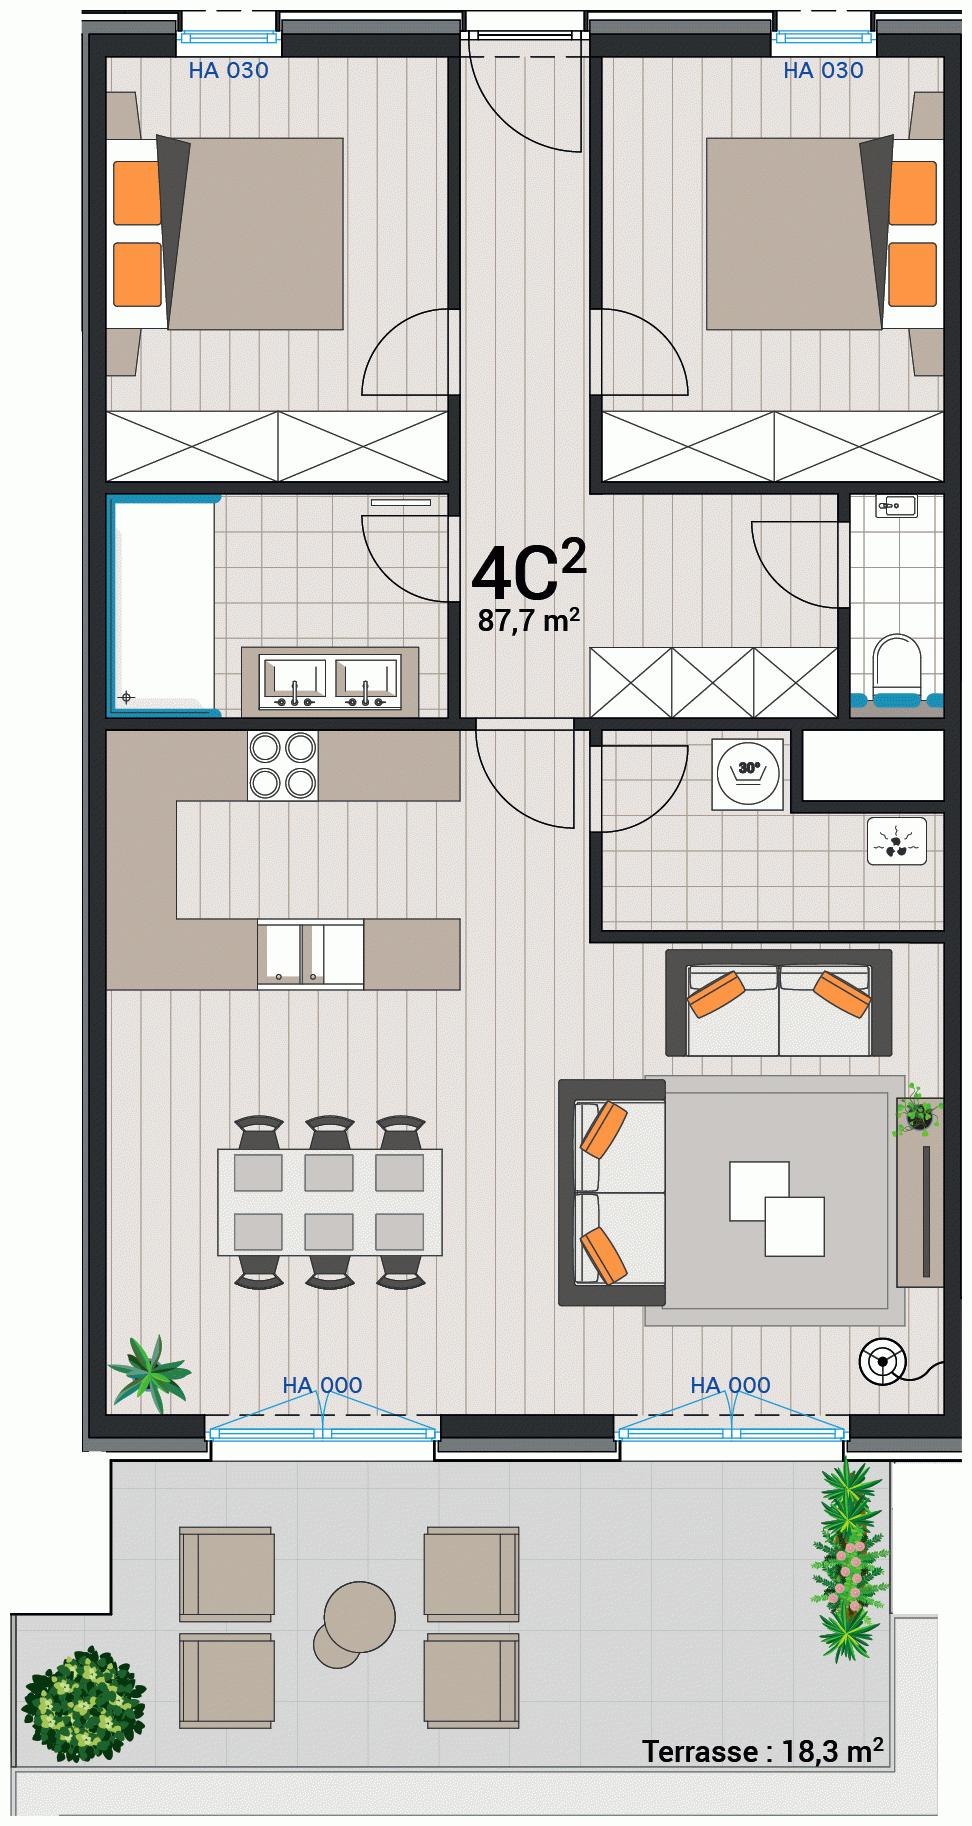 Appartement 4C